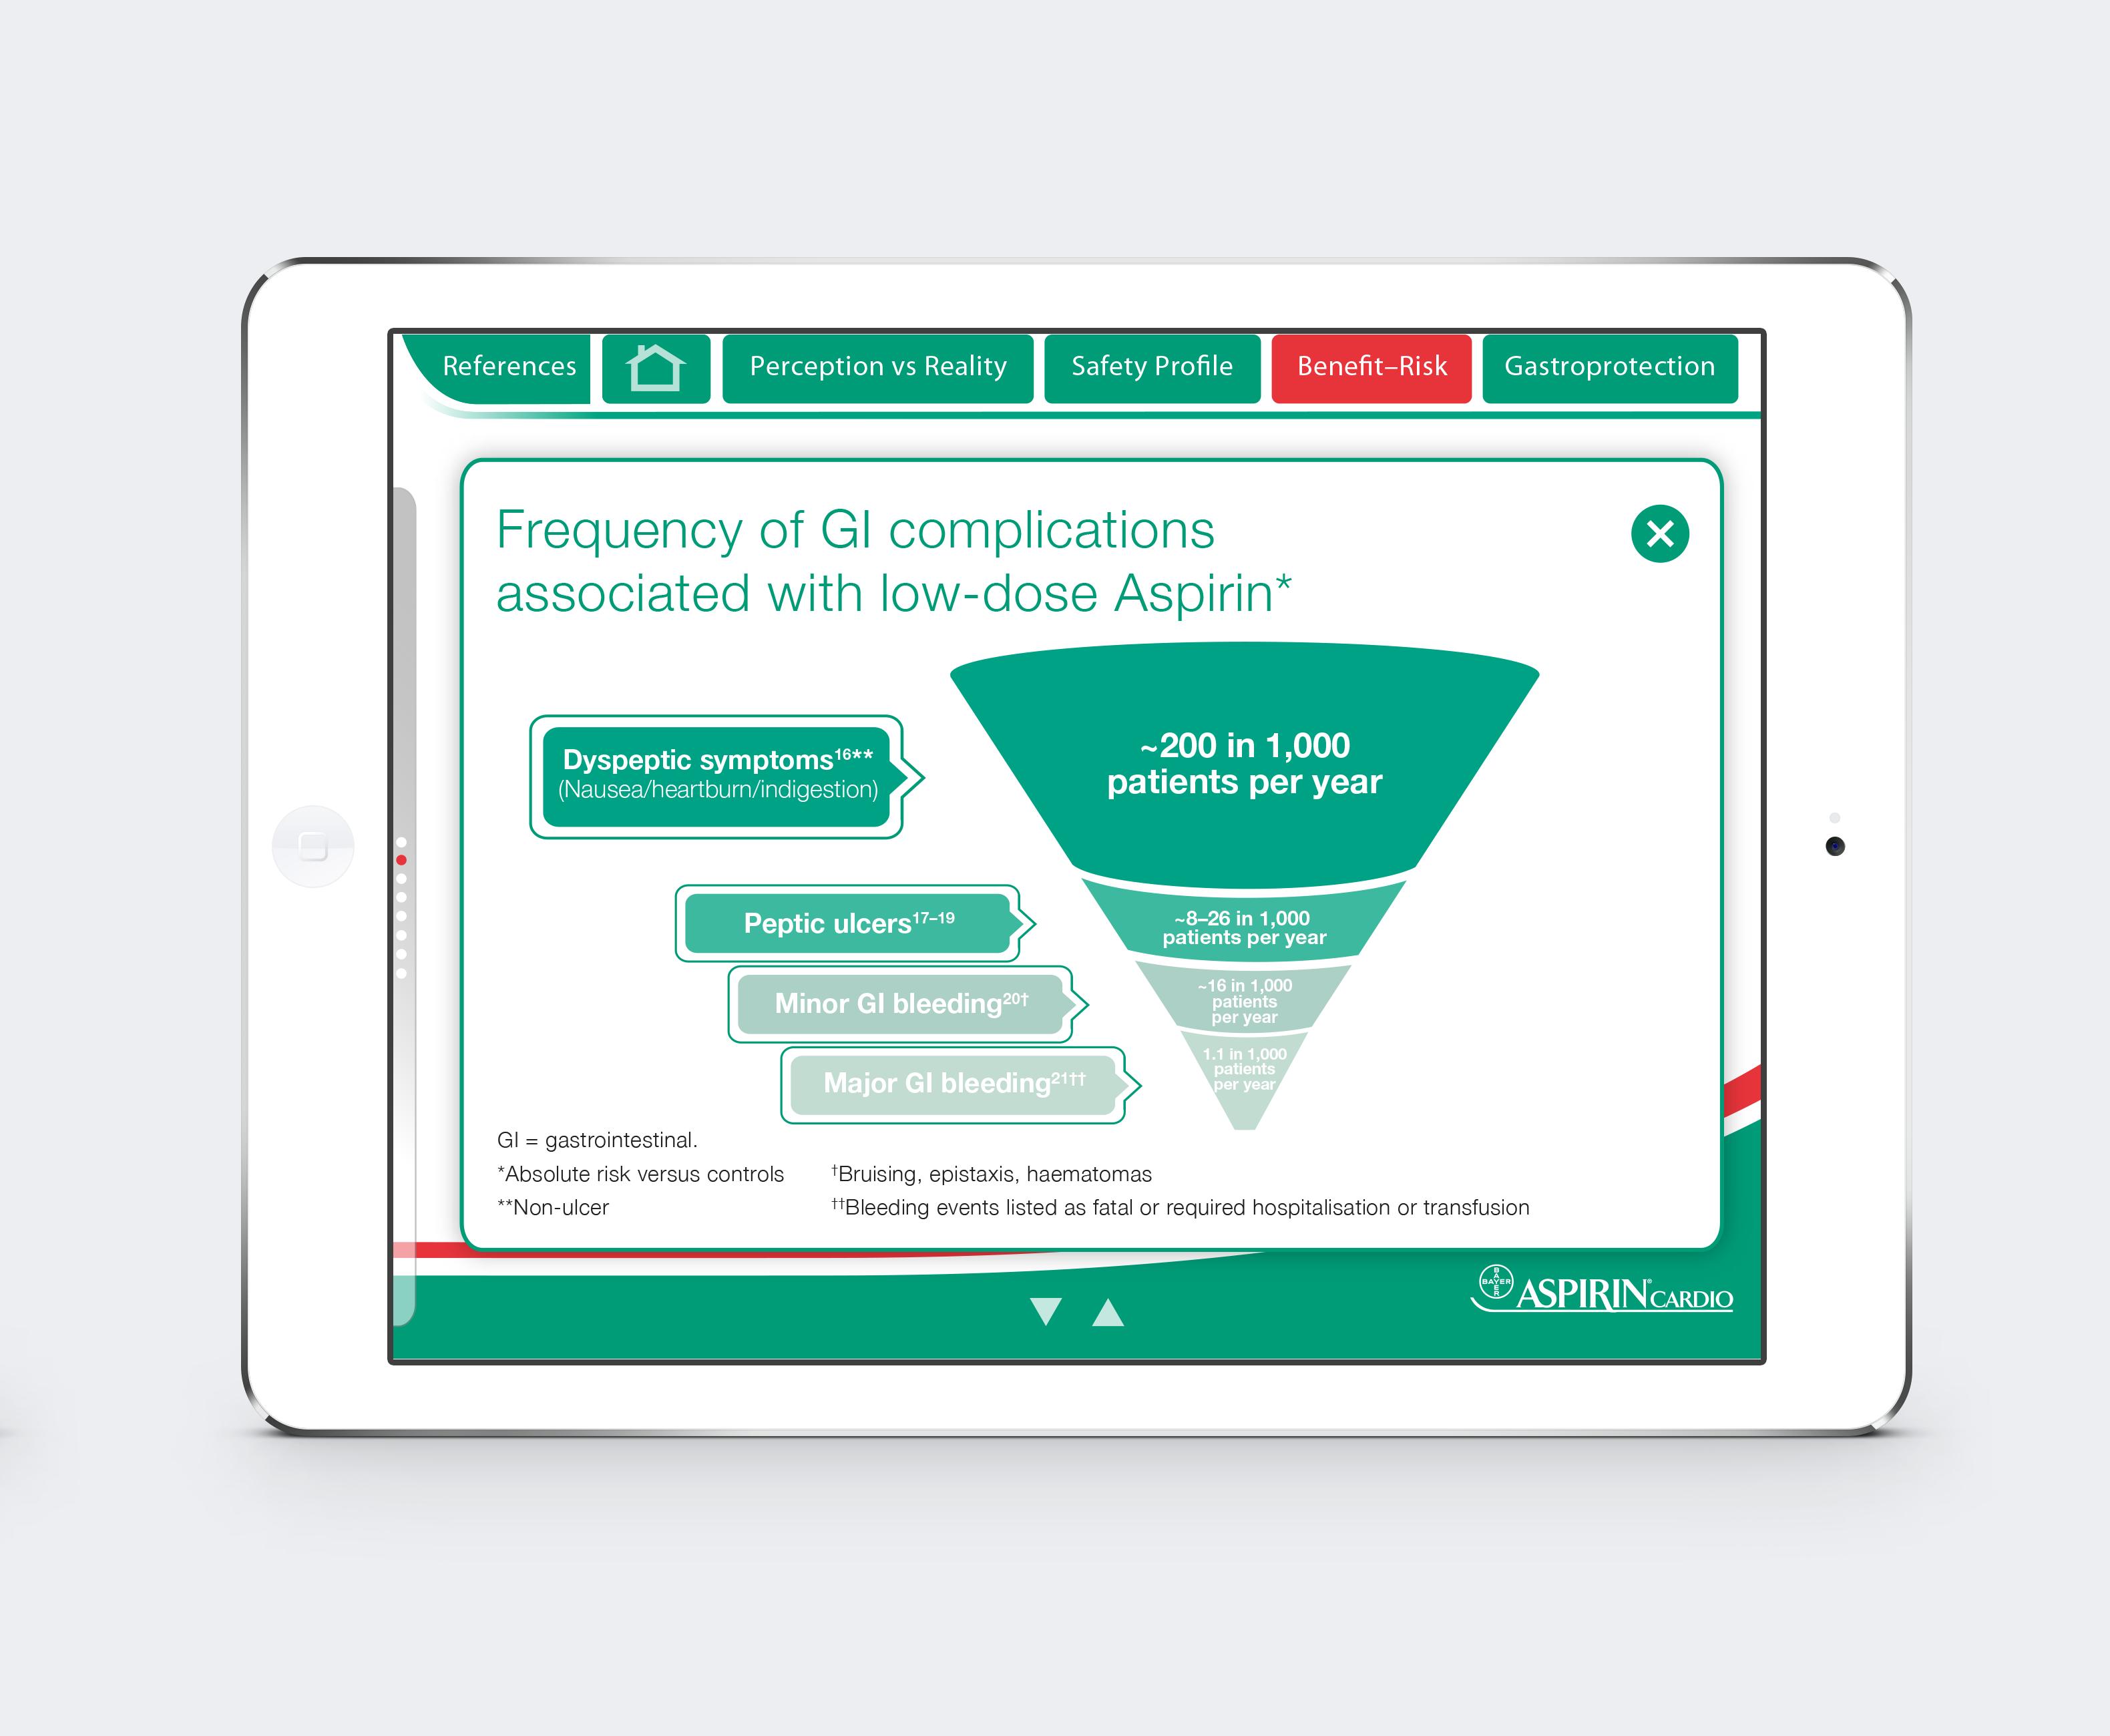 02-iPad-Air-Landscape-Mock-up_aspirin1